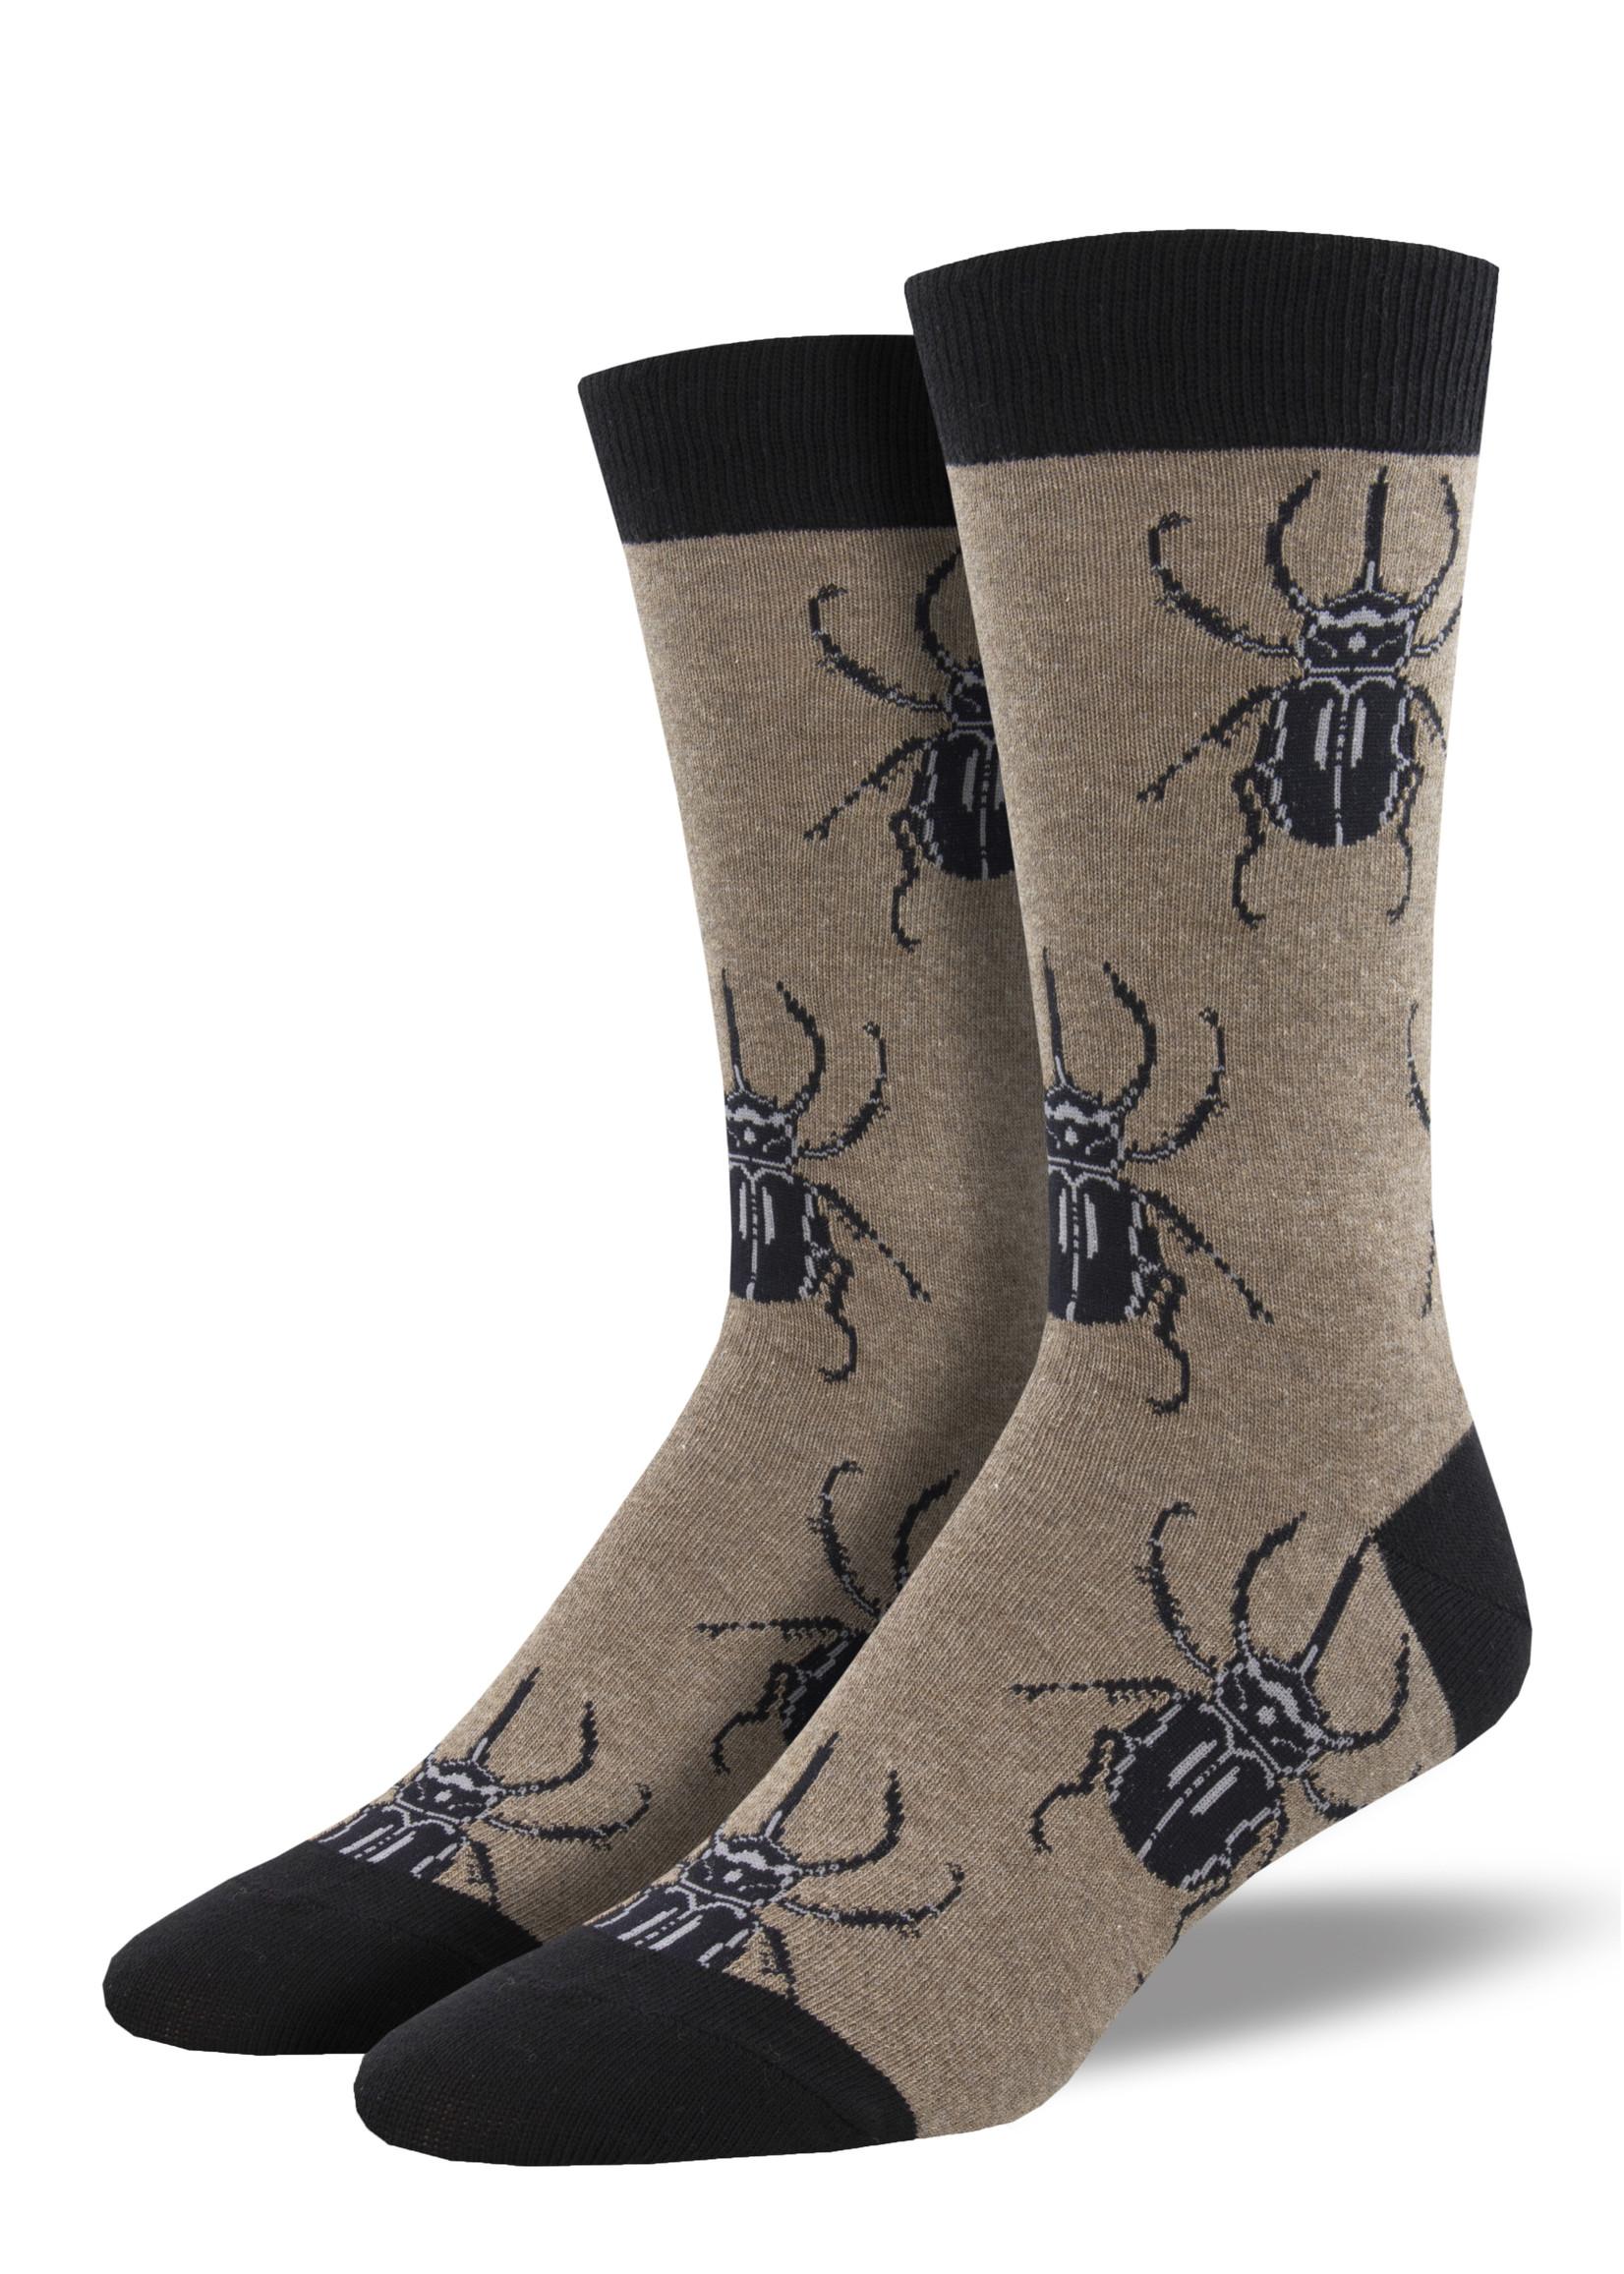 Socksmith Canada Inc MEN'S BEETLE MANIA SOCKS